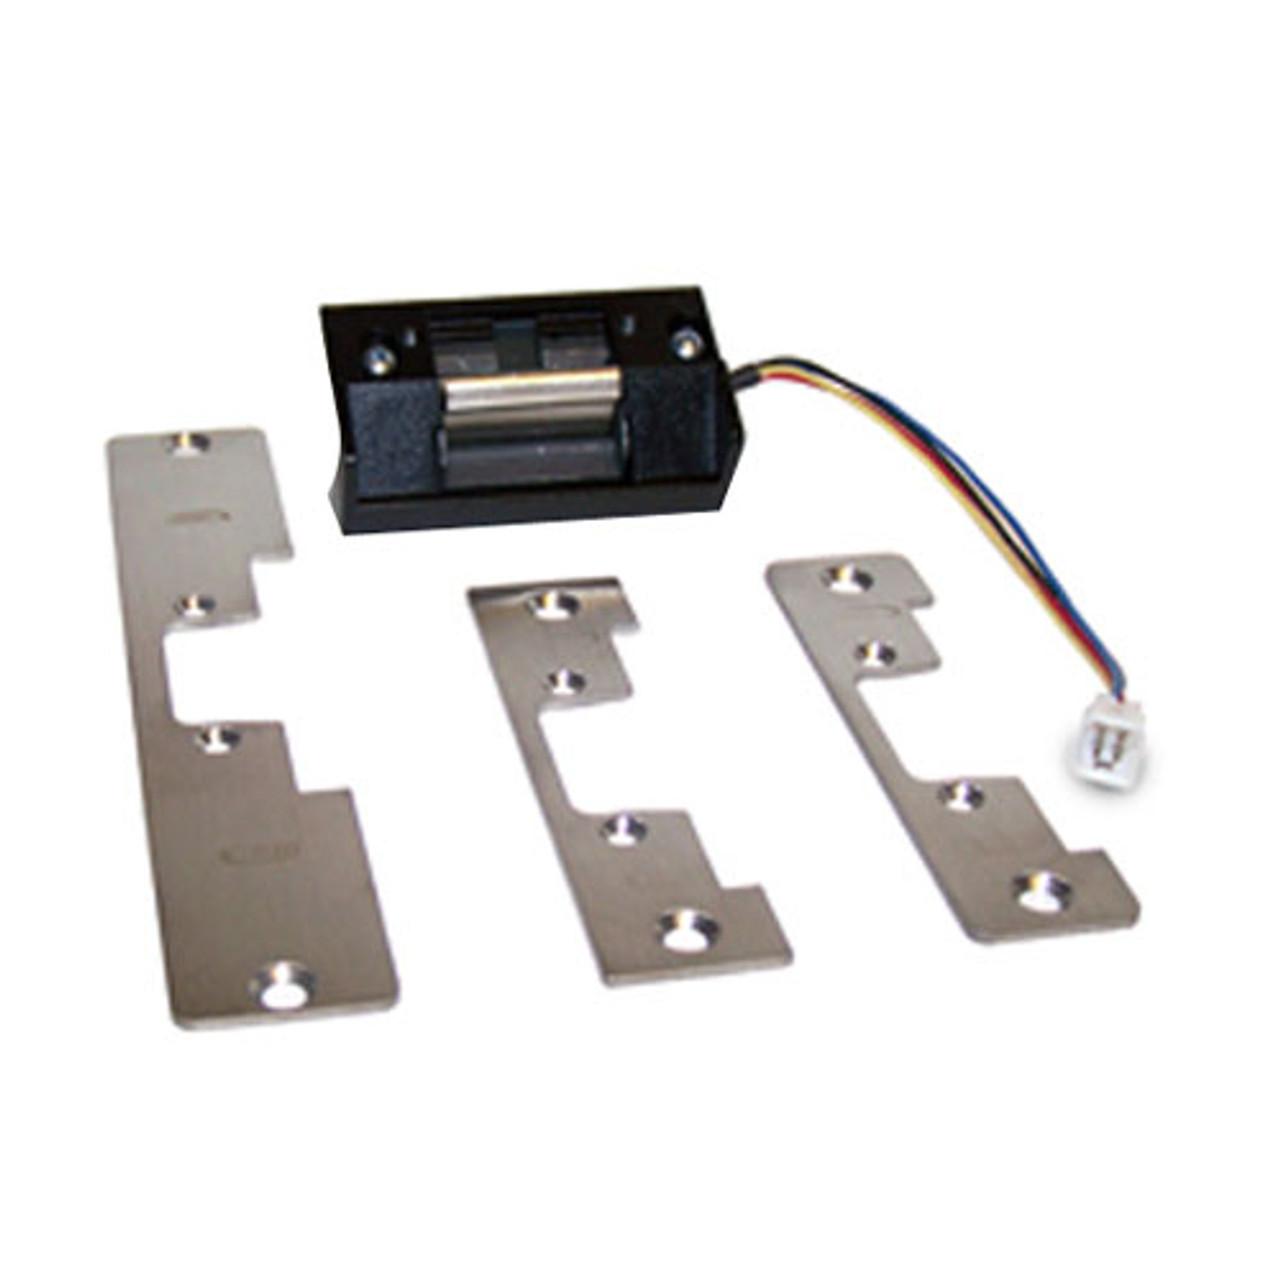 electric door strike wiring diagram rci on electric scooter controller wiring diagram electric window relay  [ 1280 x 1280 Pixel ]